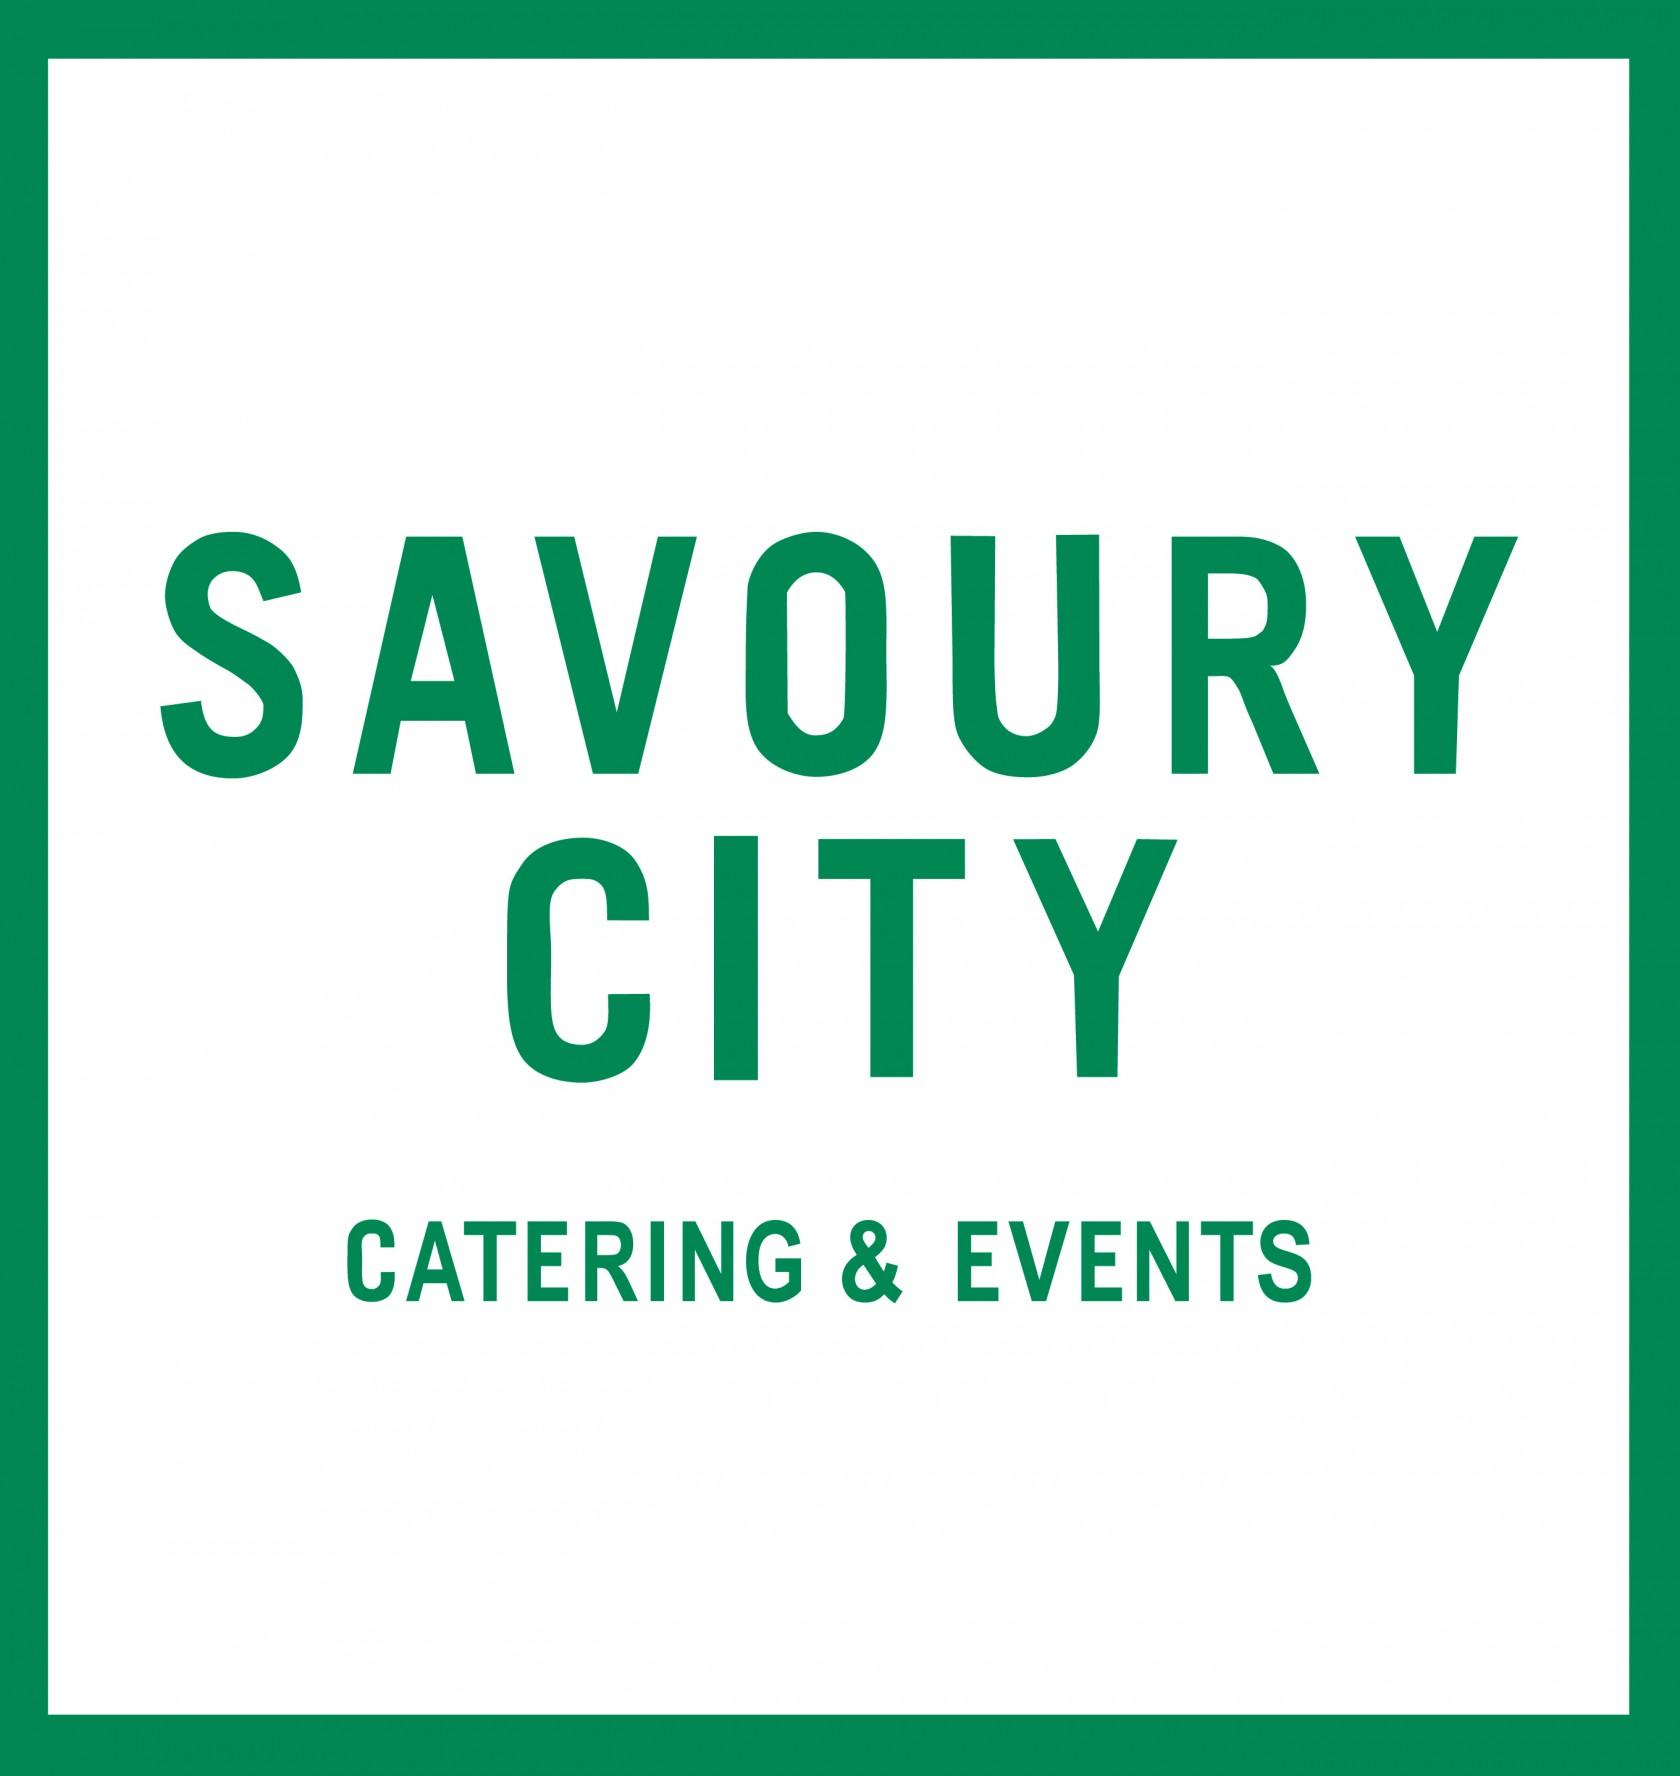 new-Savoury City-logo